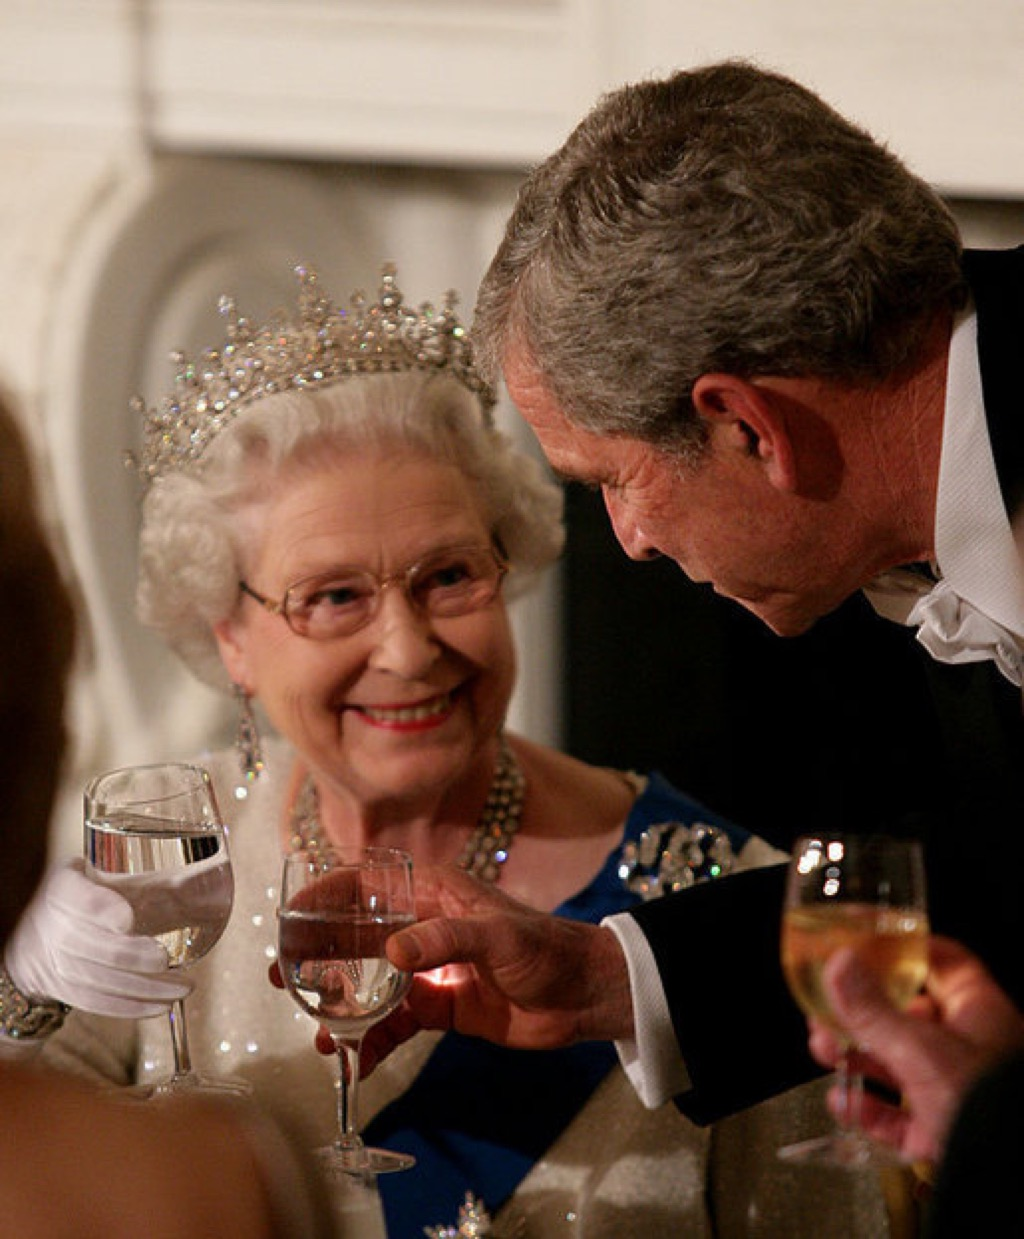 Queen Elizabeth only wears her tiara at night